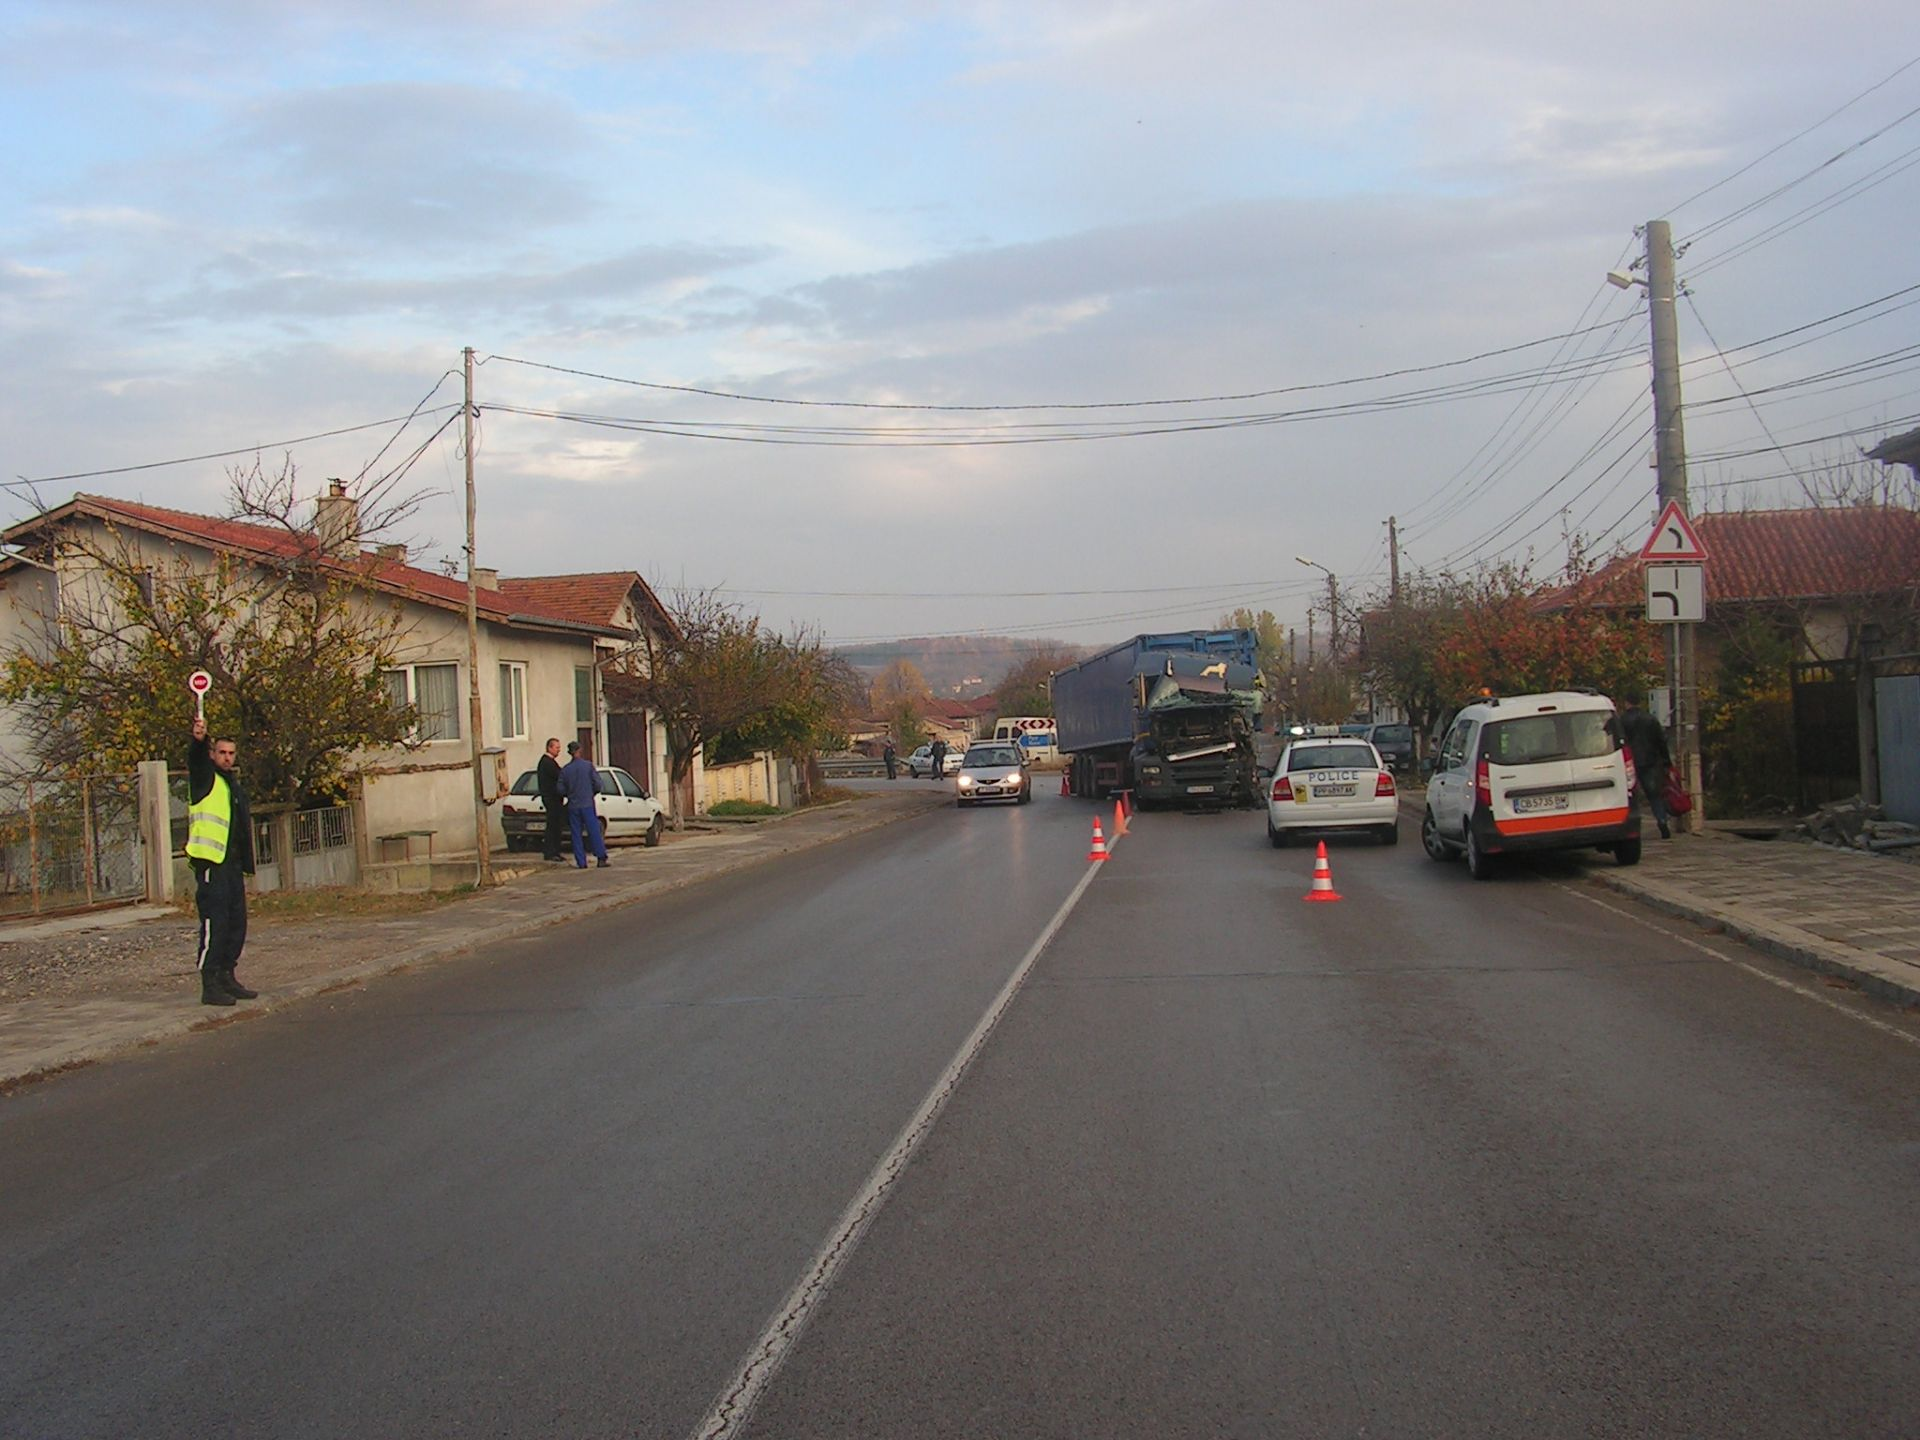 ТИР-овете са с българска и румънска регистрации